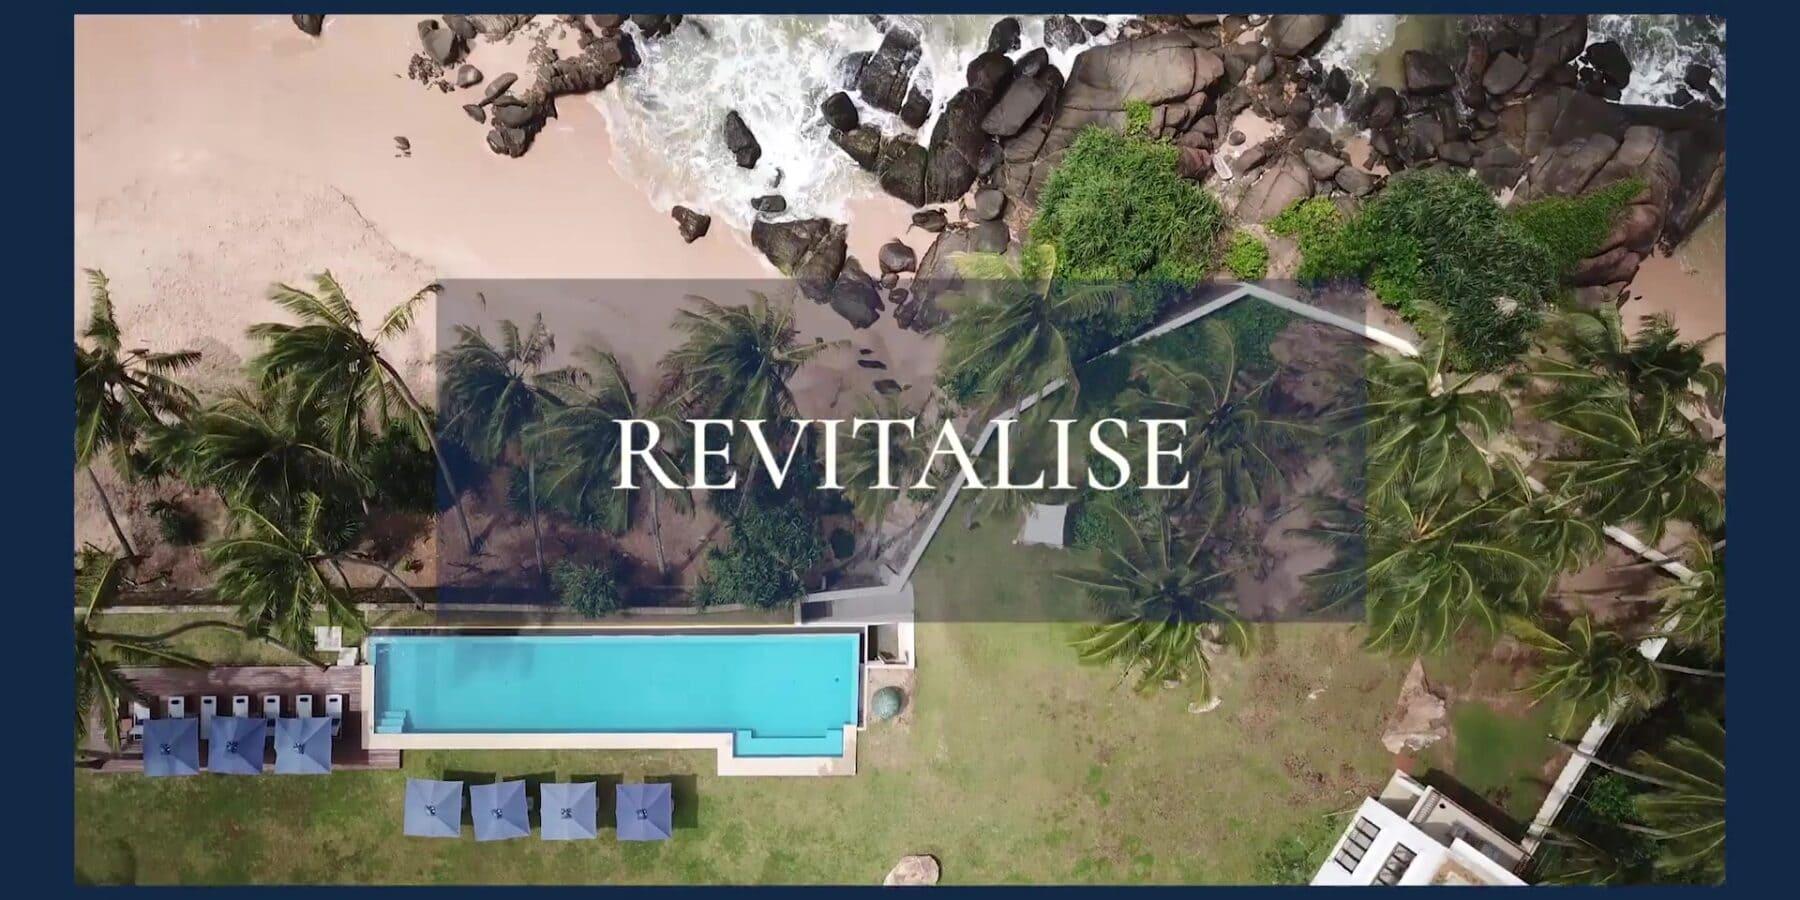 Revitalise collection logo laid over Sri Lankan beach scene